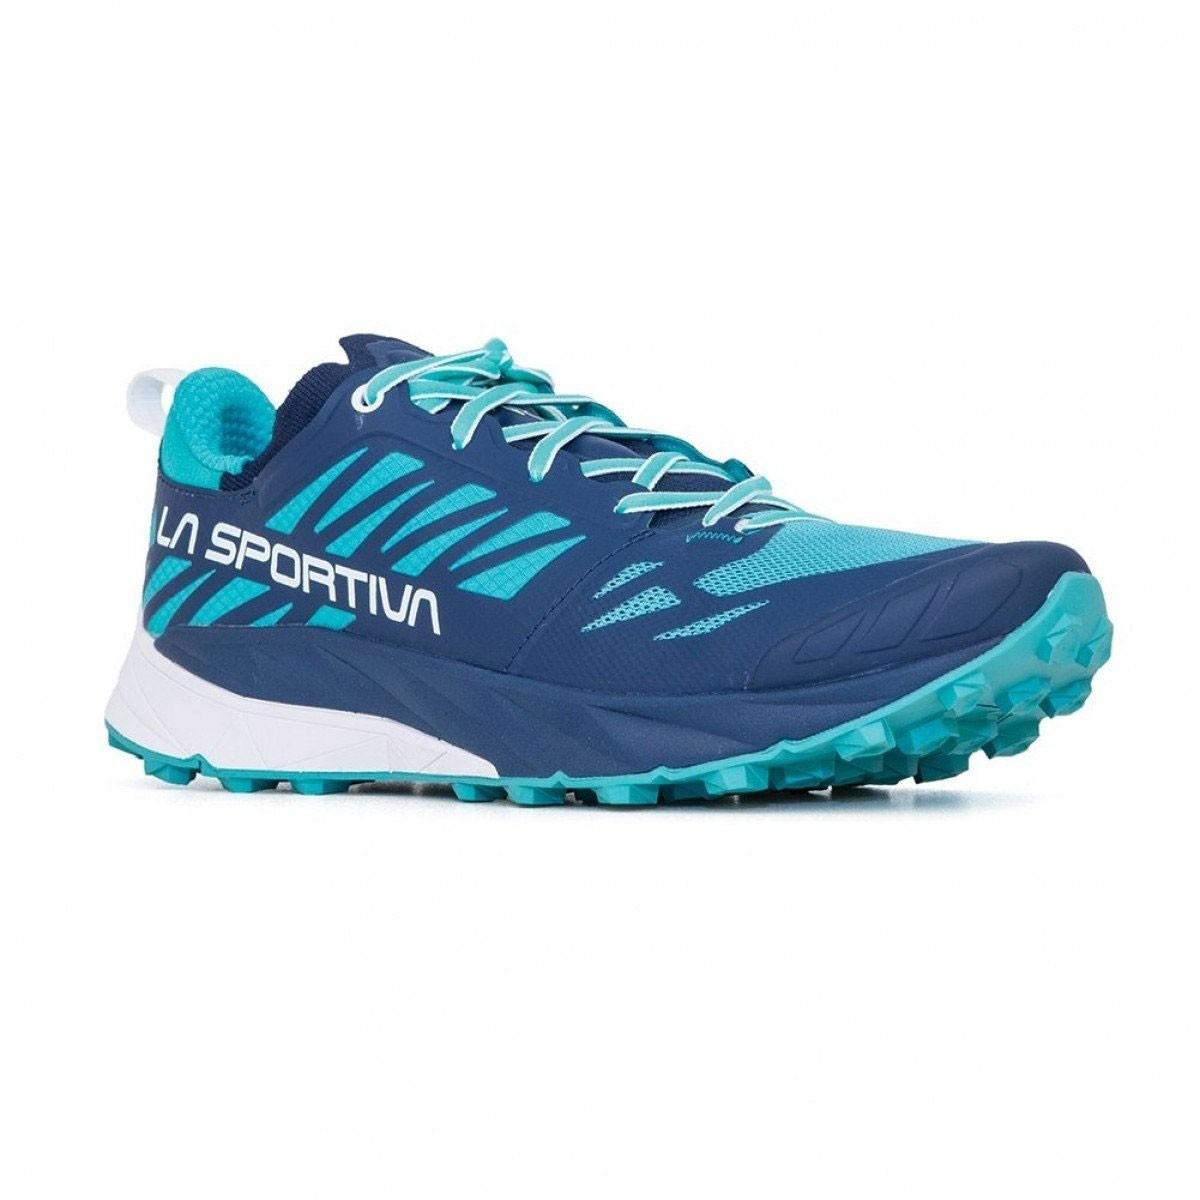 La Sportiva La Sportiva Kaptiva Running Shoe - Womens - Marine Blue/Aqua